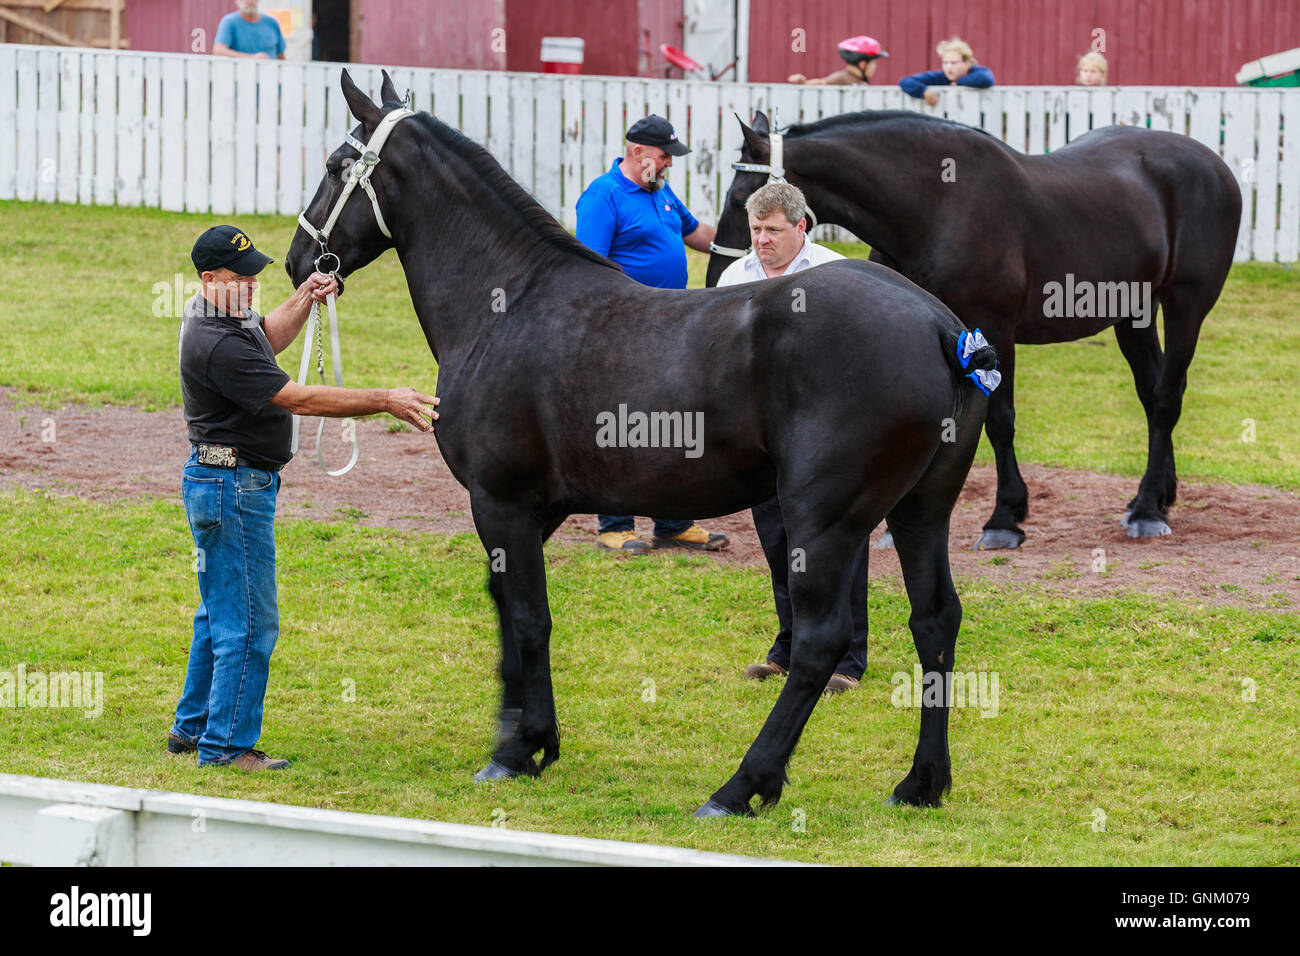 Prince Edward Island, Canada, Aug 27,2016. Competitors show horses at the Prince Edward Island Plowing Match & - Stock Image